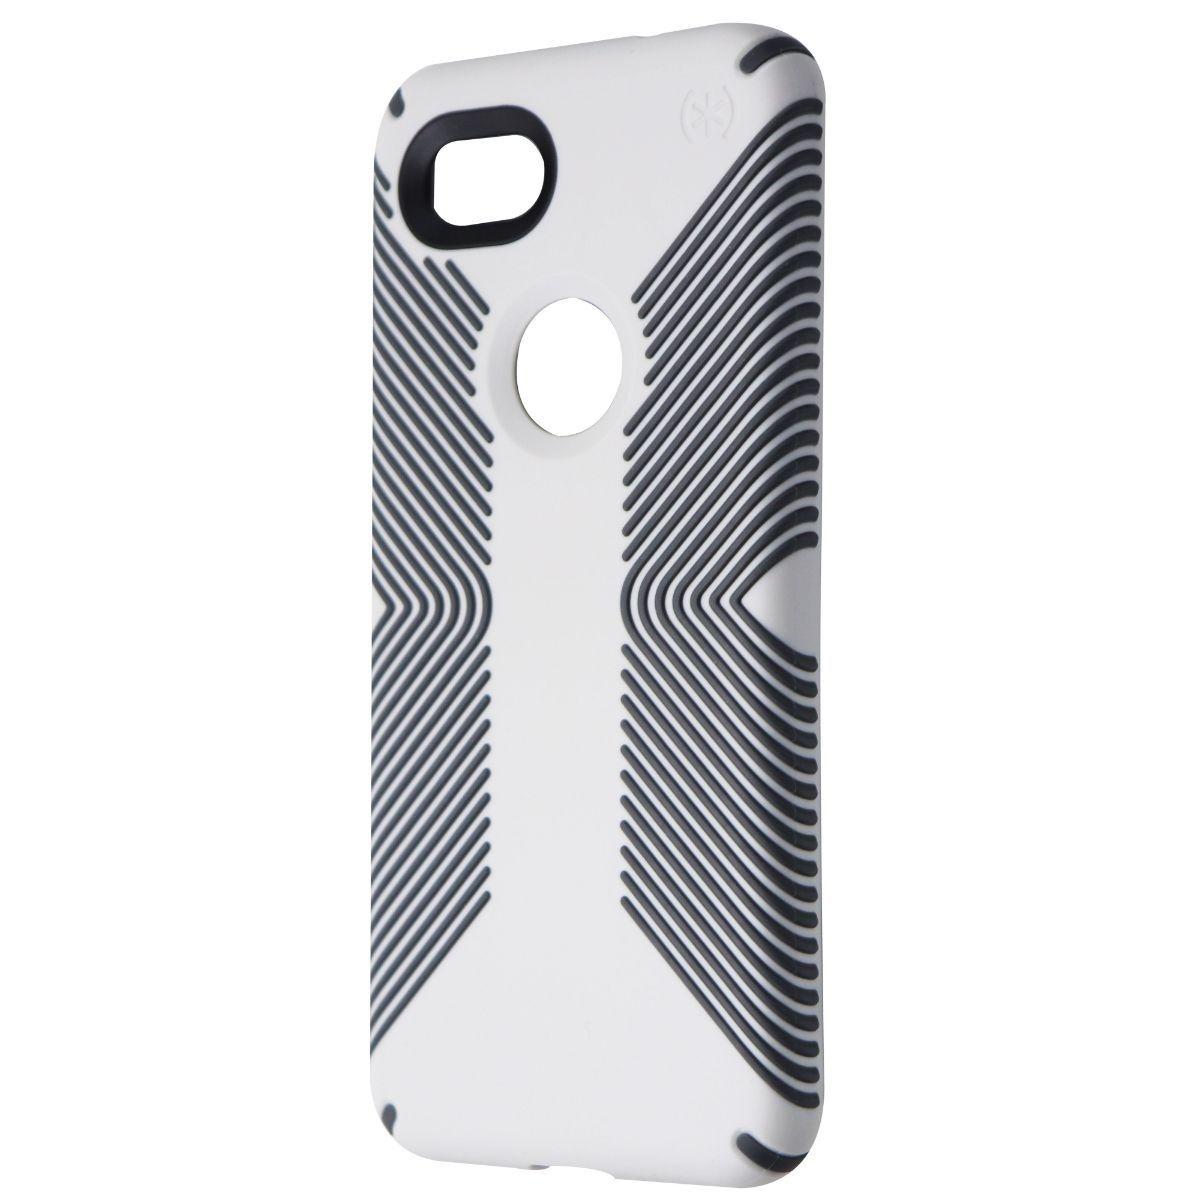 Speck Presidio Grip Case Google Pixel 3a XL - Marble Grey/Anthracite Grey